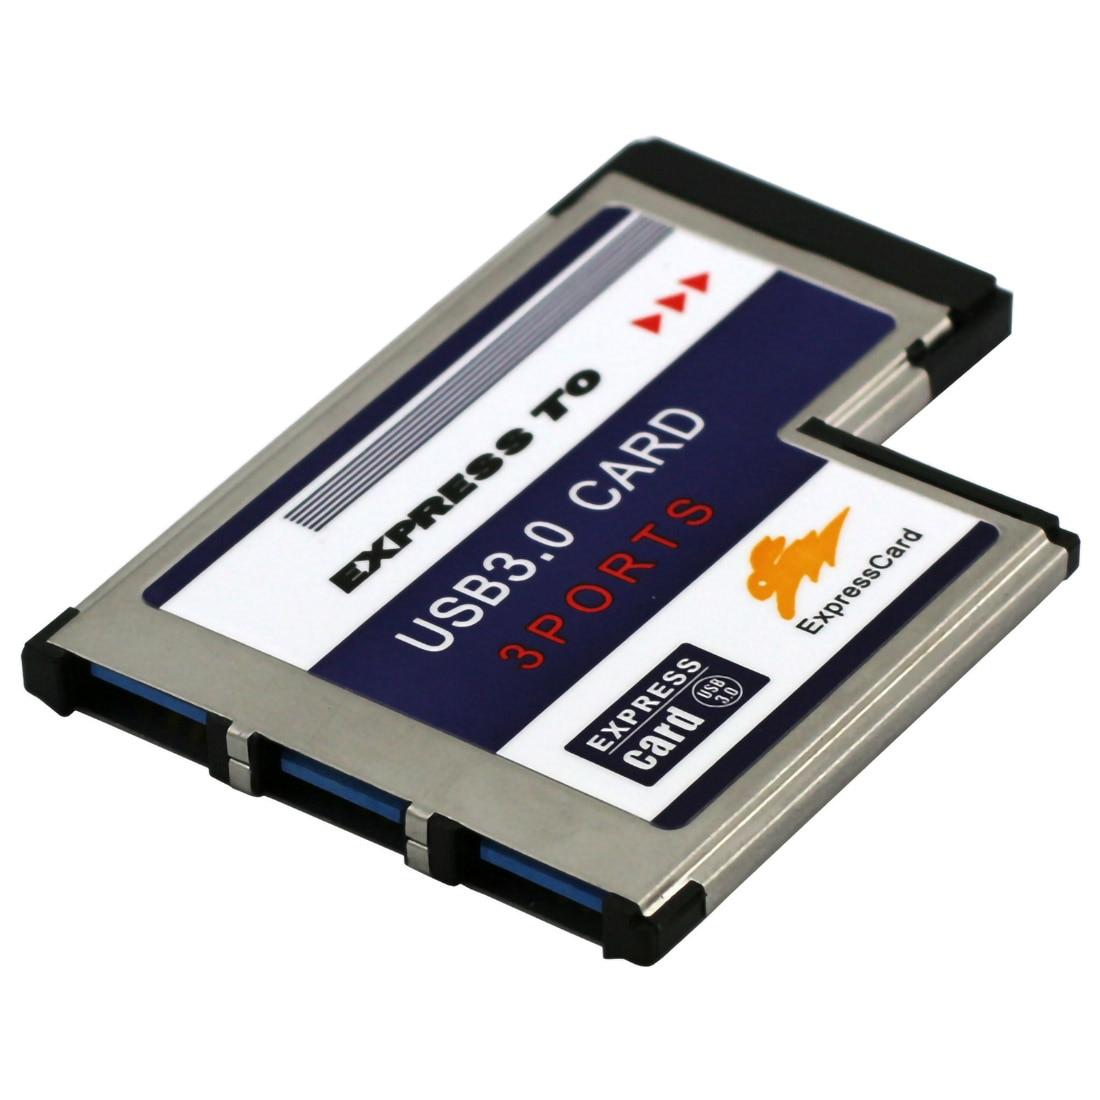 3 Ports Hidden Inside USB 3.0 To Expresscard 54mm USB3.0 Adapter Converter For PCMCIA Express Card Laptop Notebook PC